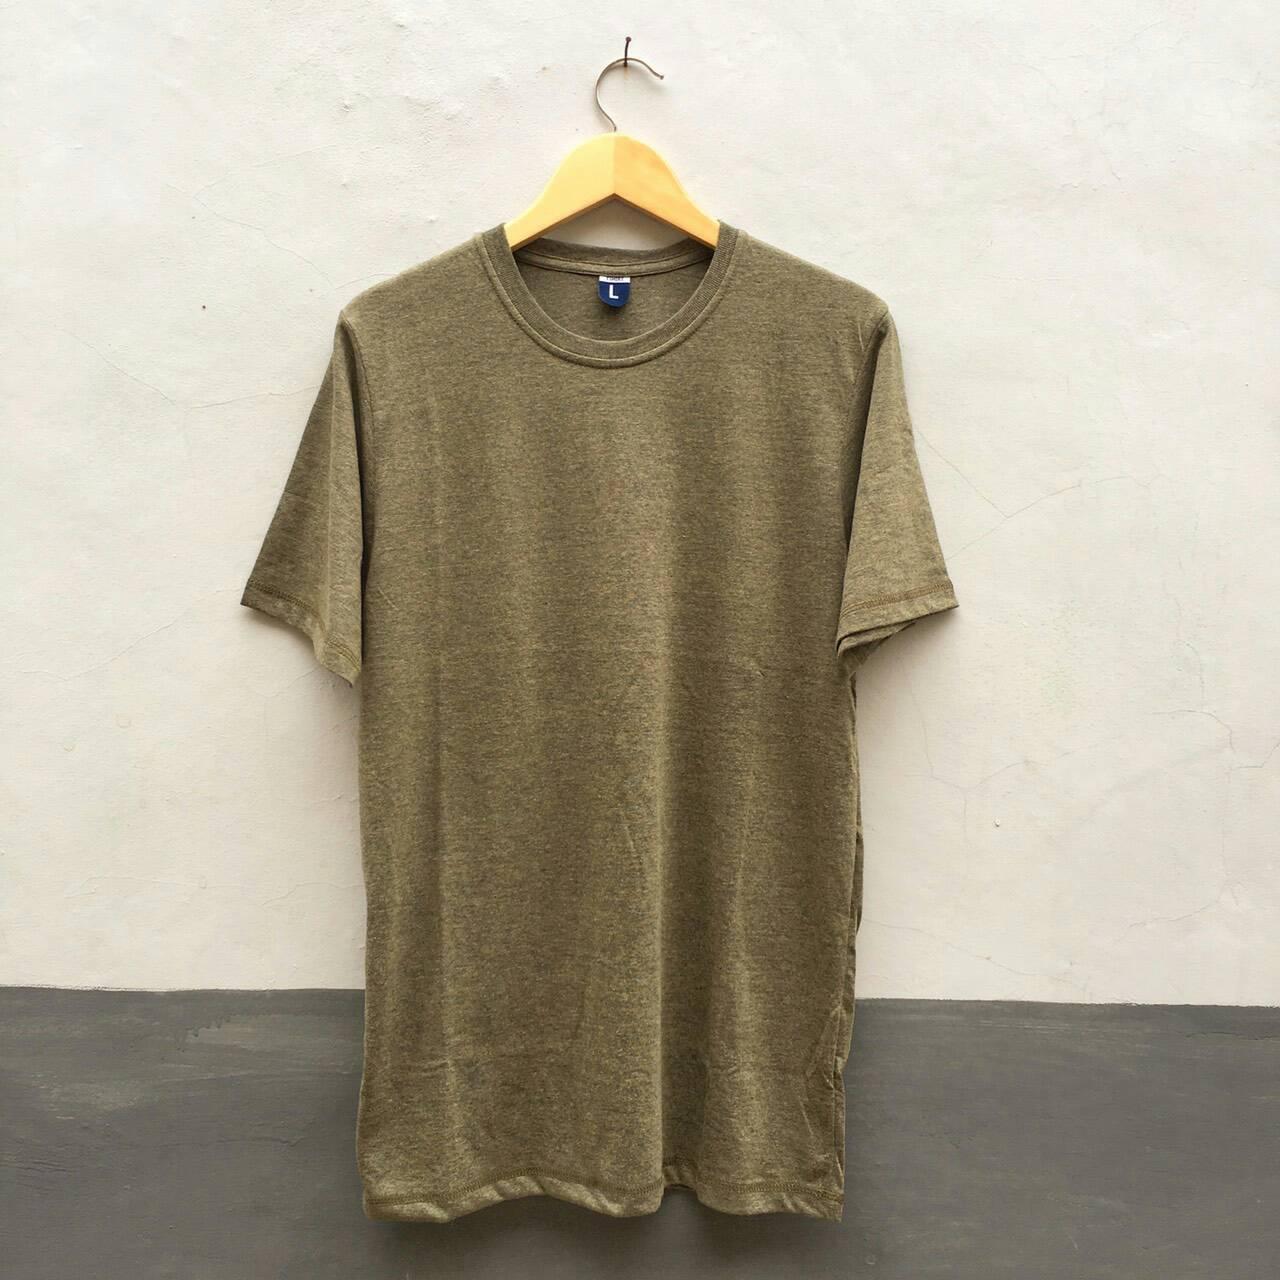 Cottoncombedbandung Shop Line Kaos Polos Navy Misty Gold